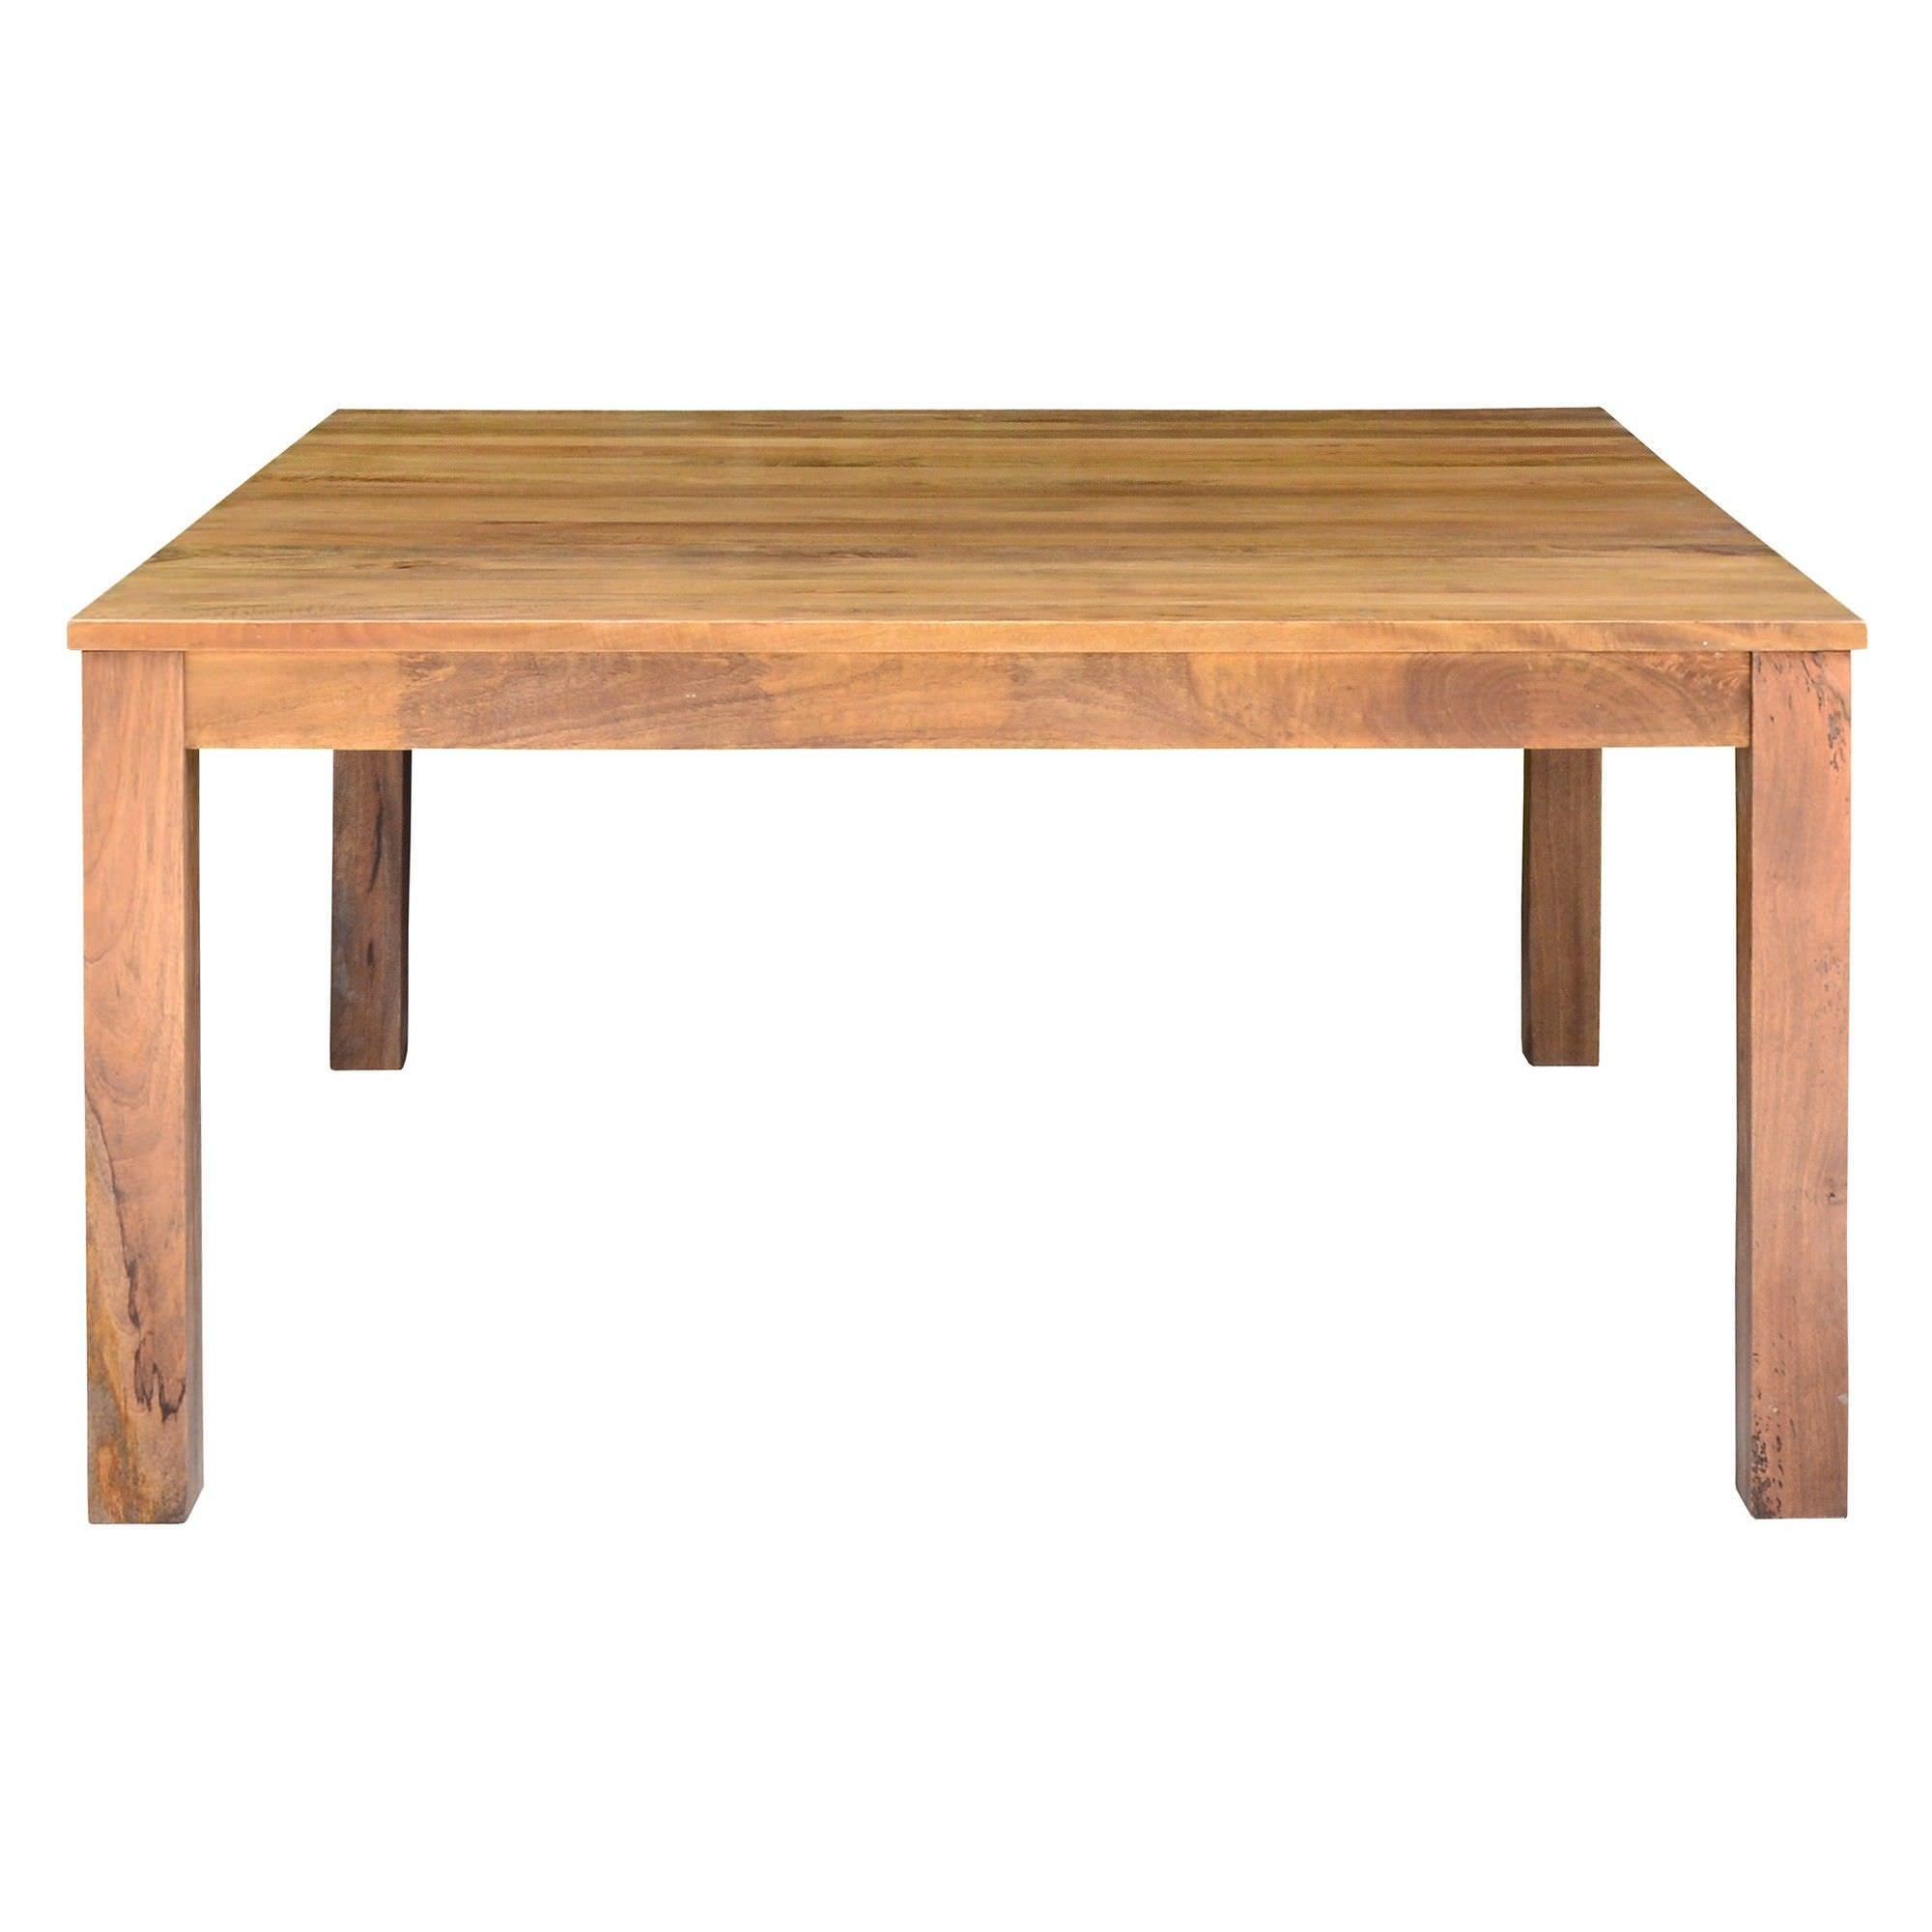 Merle Mango Wood Square Dining Table, 150cm